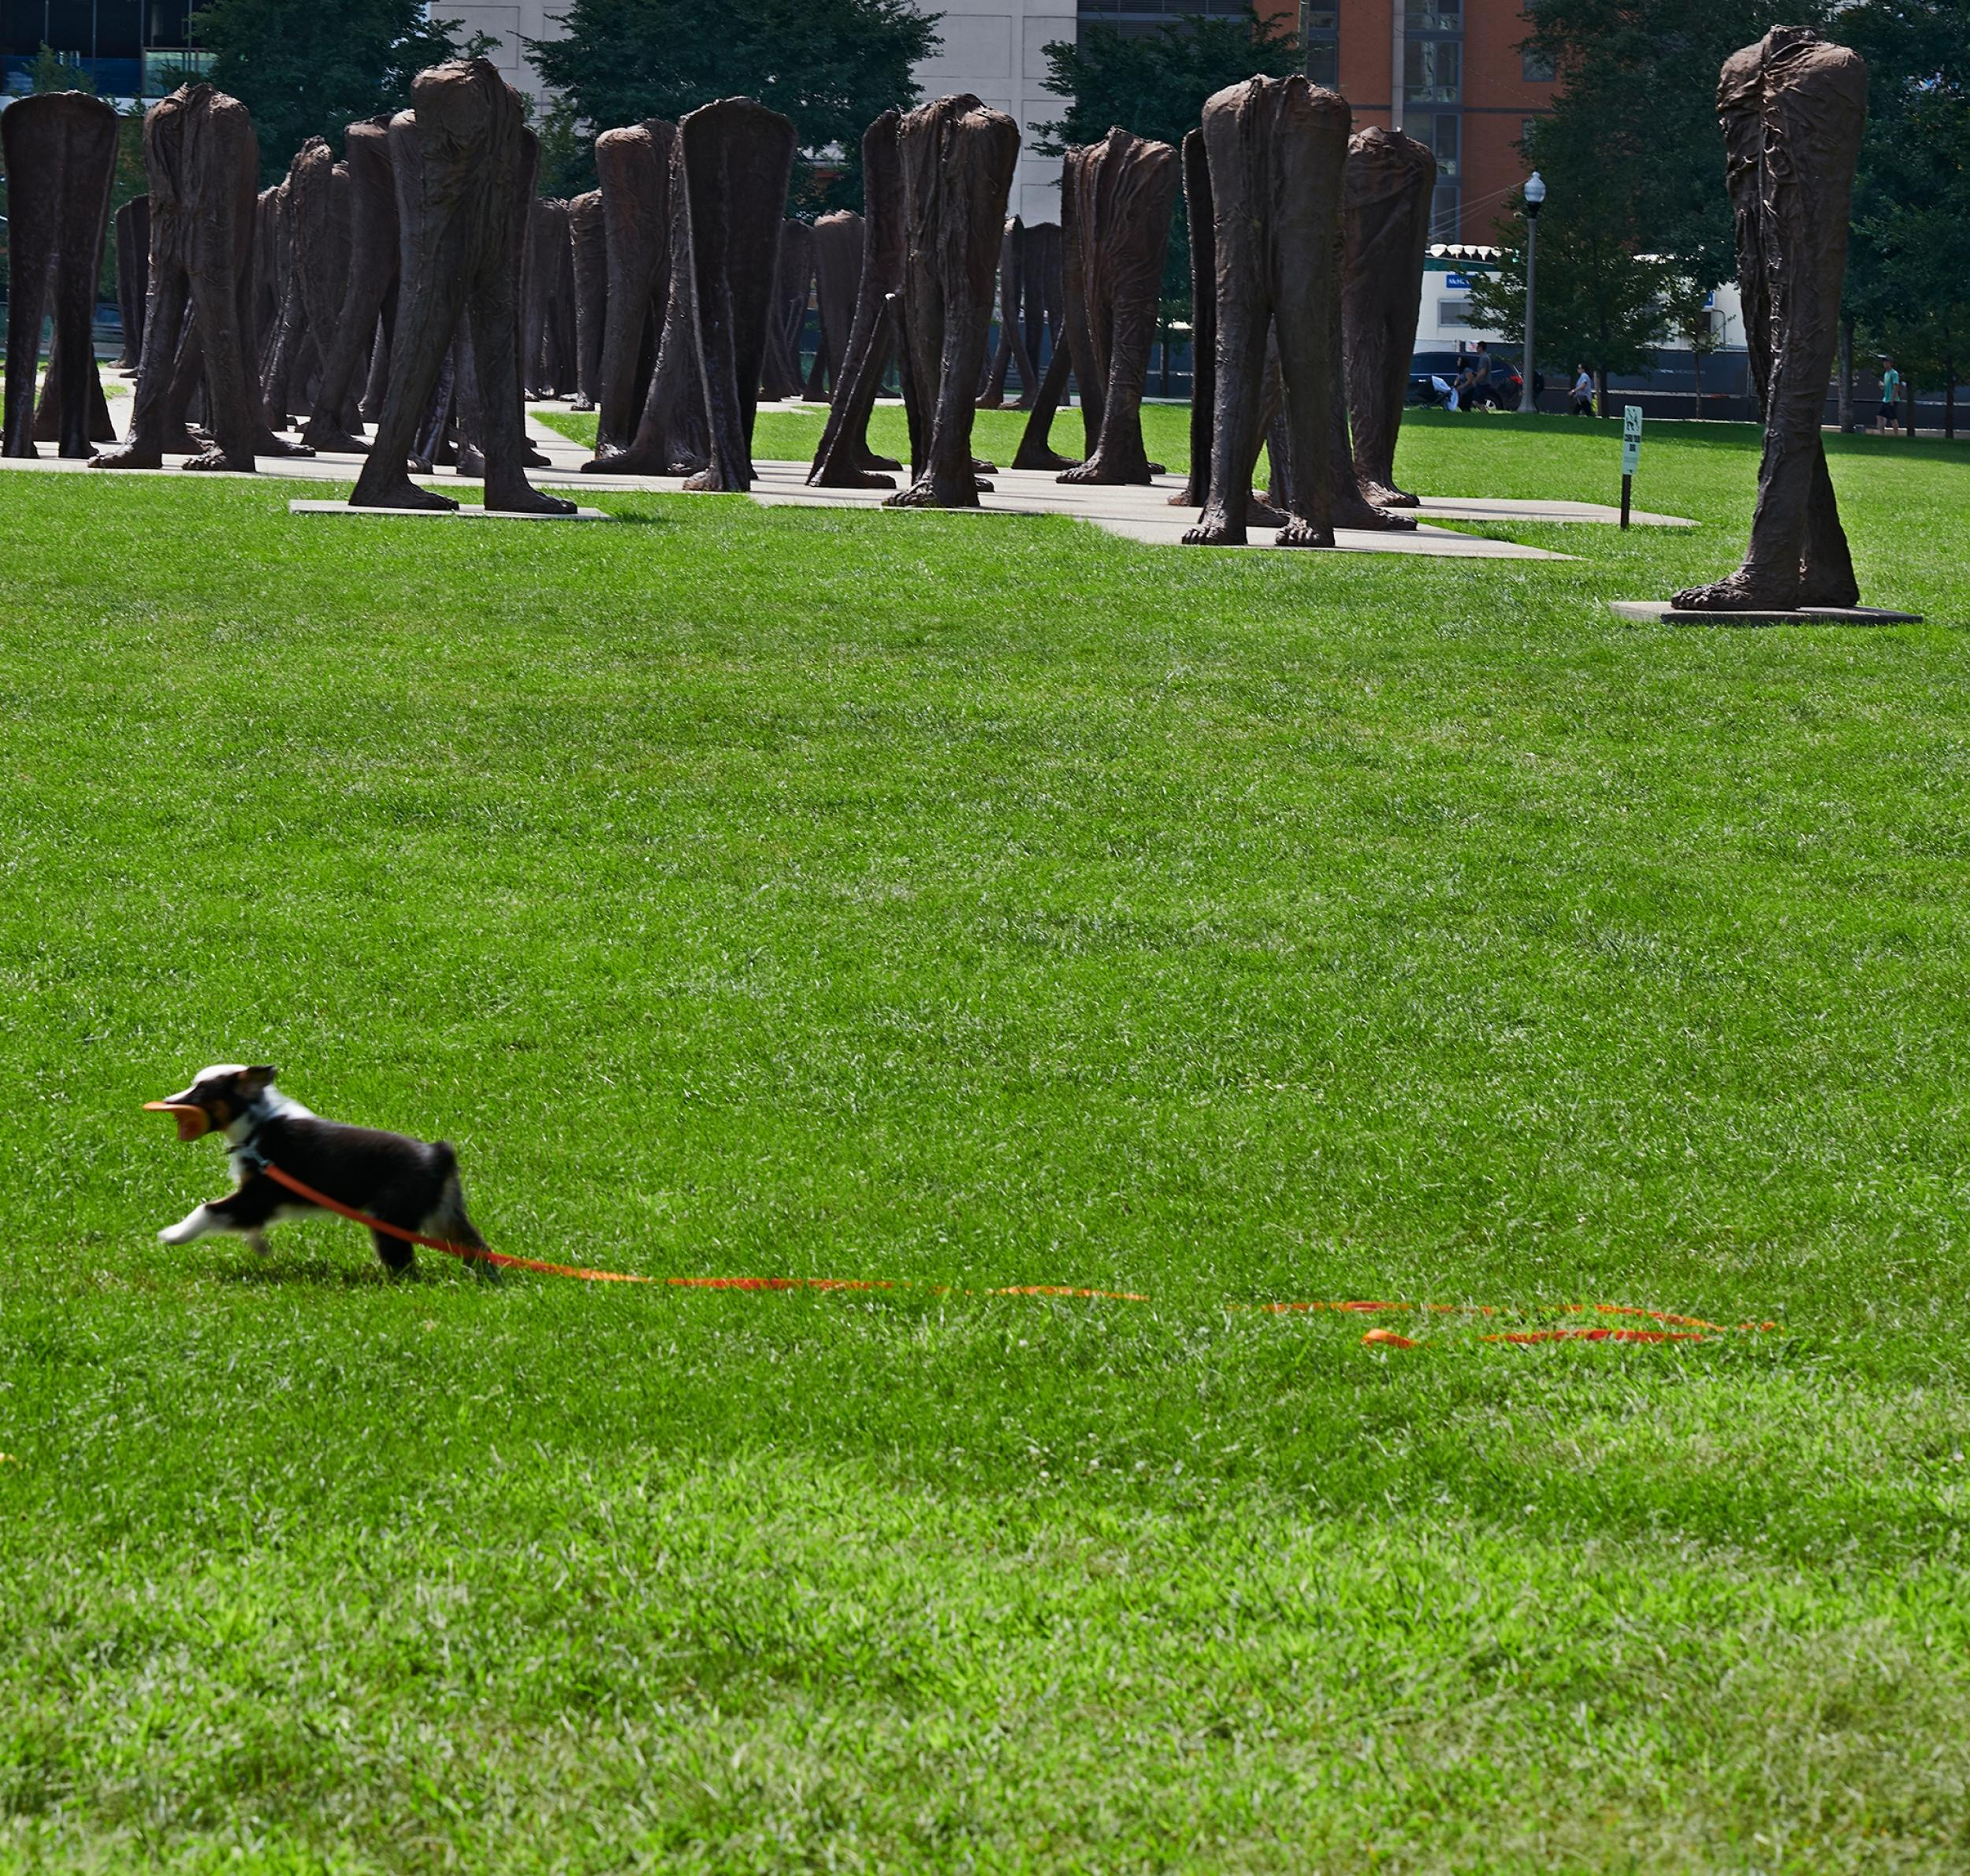 Grant Park Dog Runs